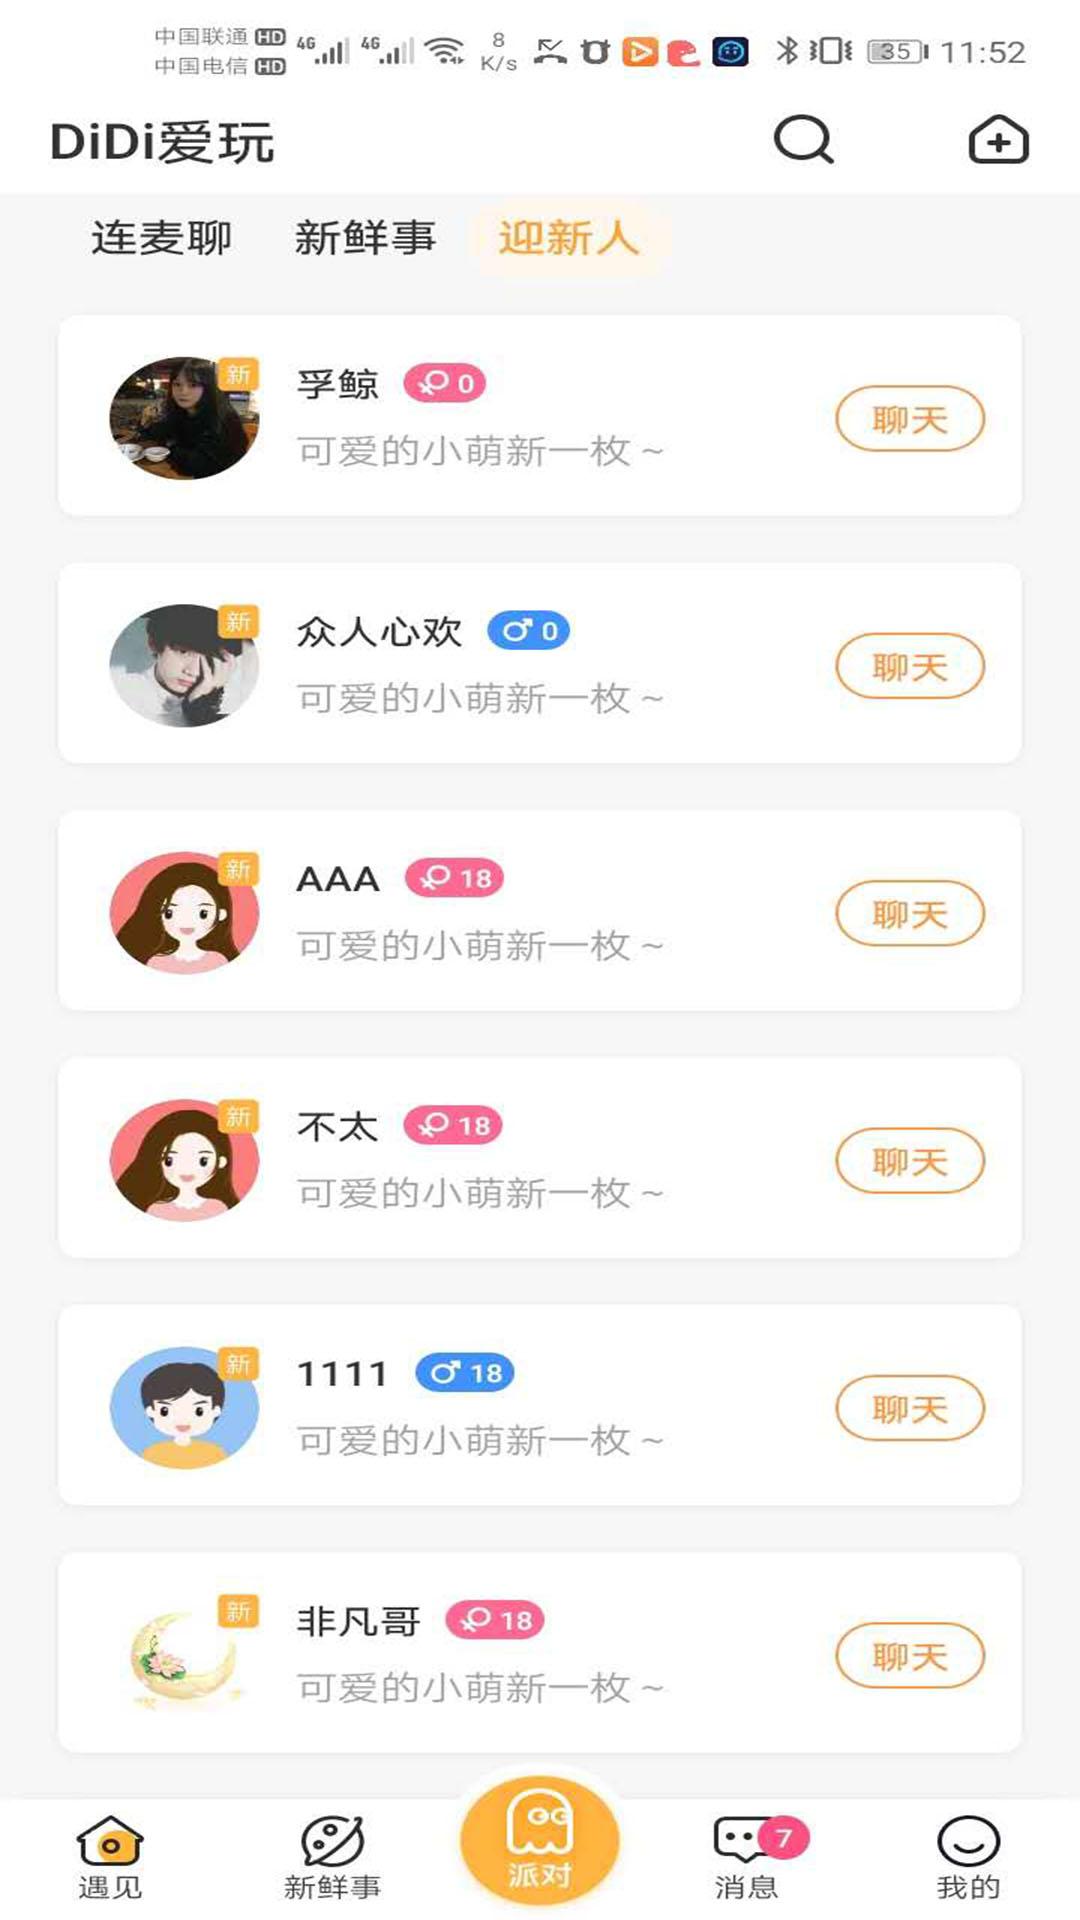 DiDi爱玩app下载官方版图3: